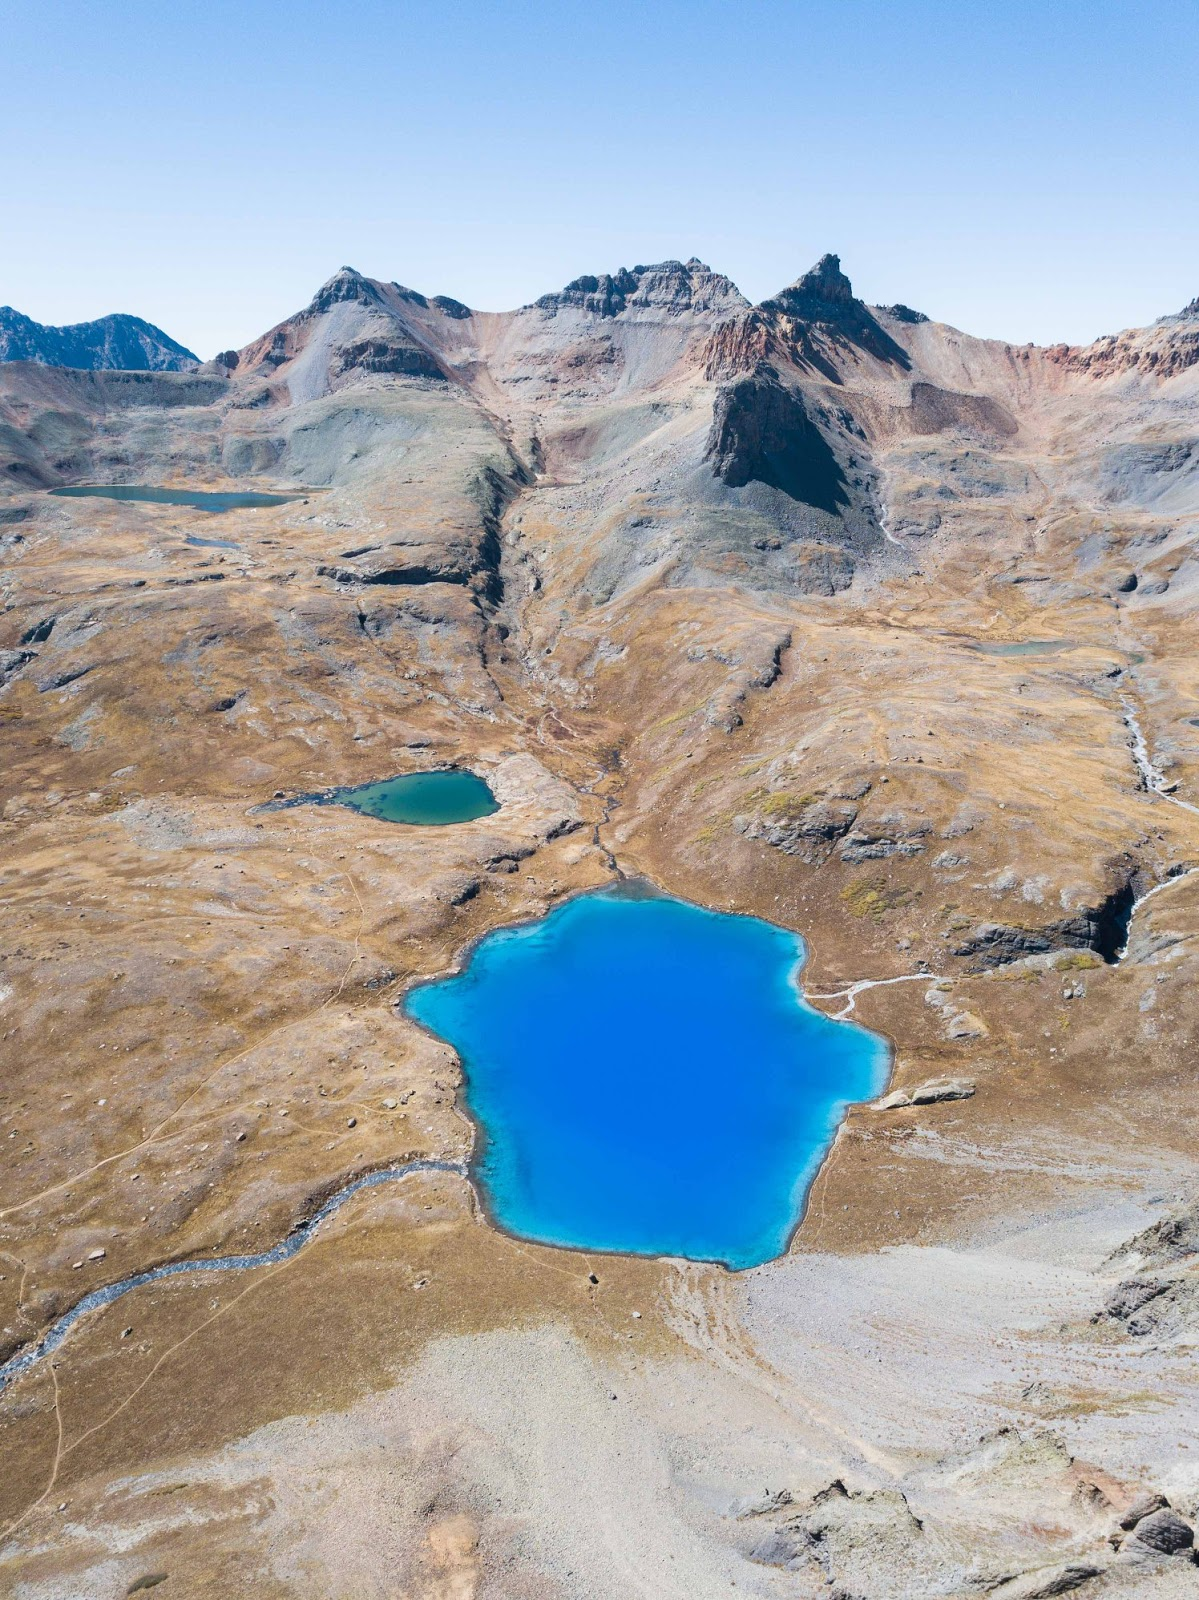 Hiking to Ice Lakes Basin, Colorado, Explore Something Films